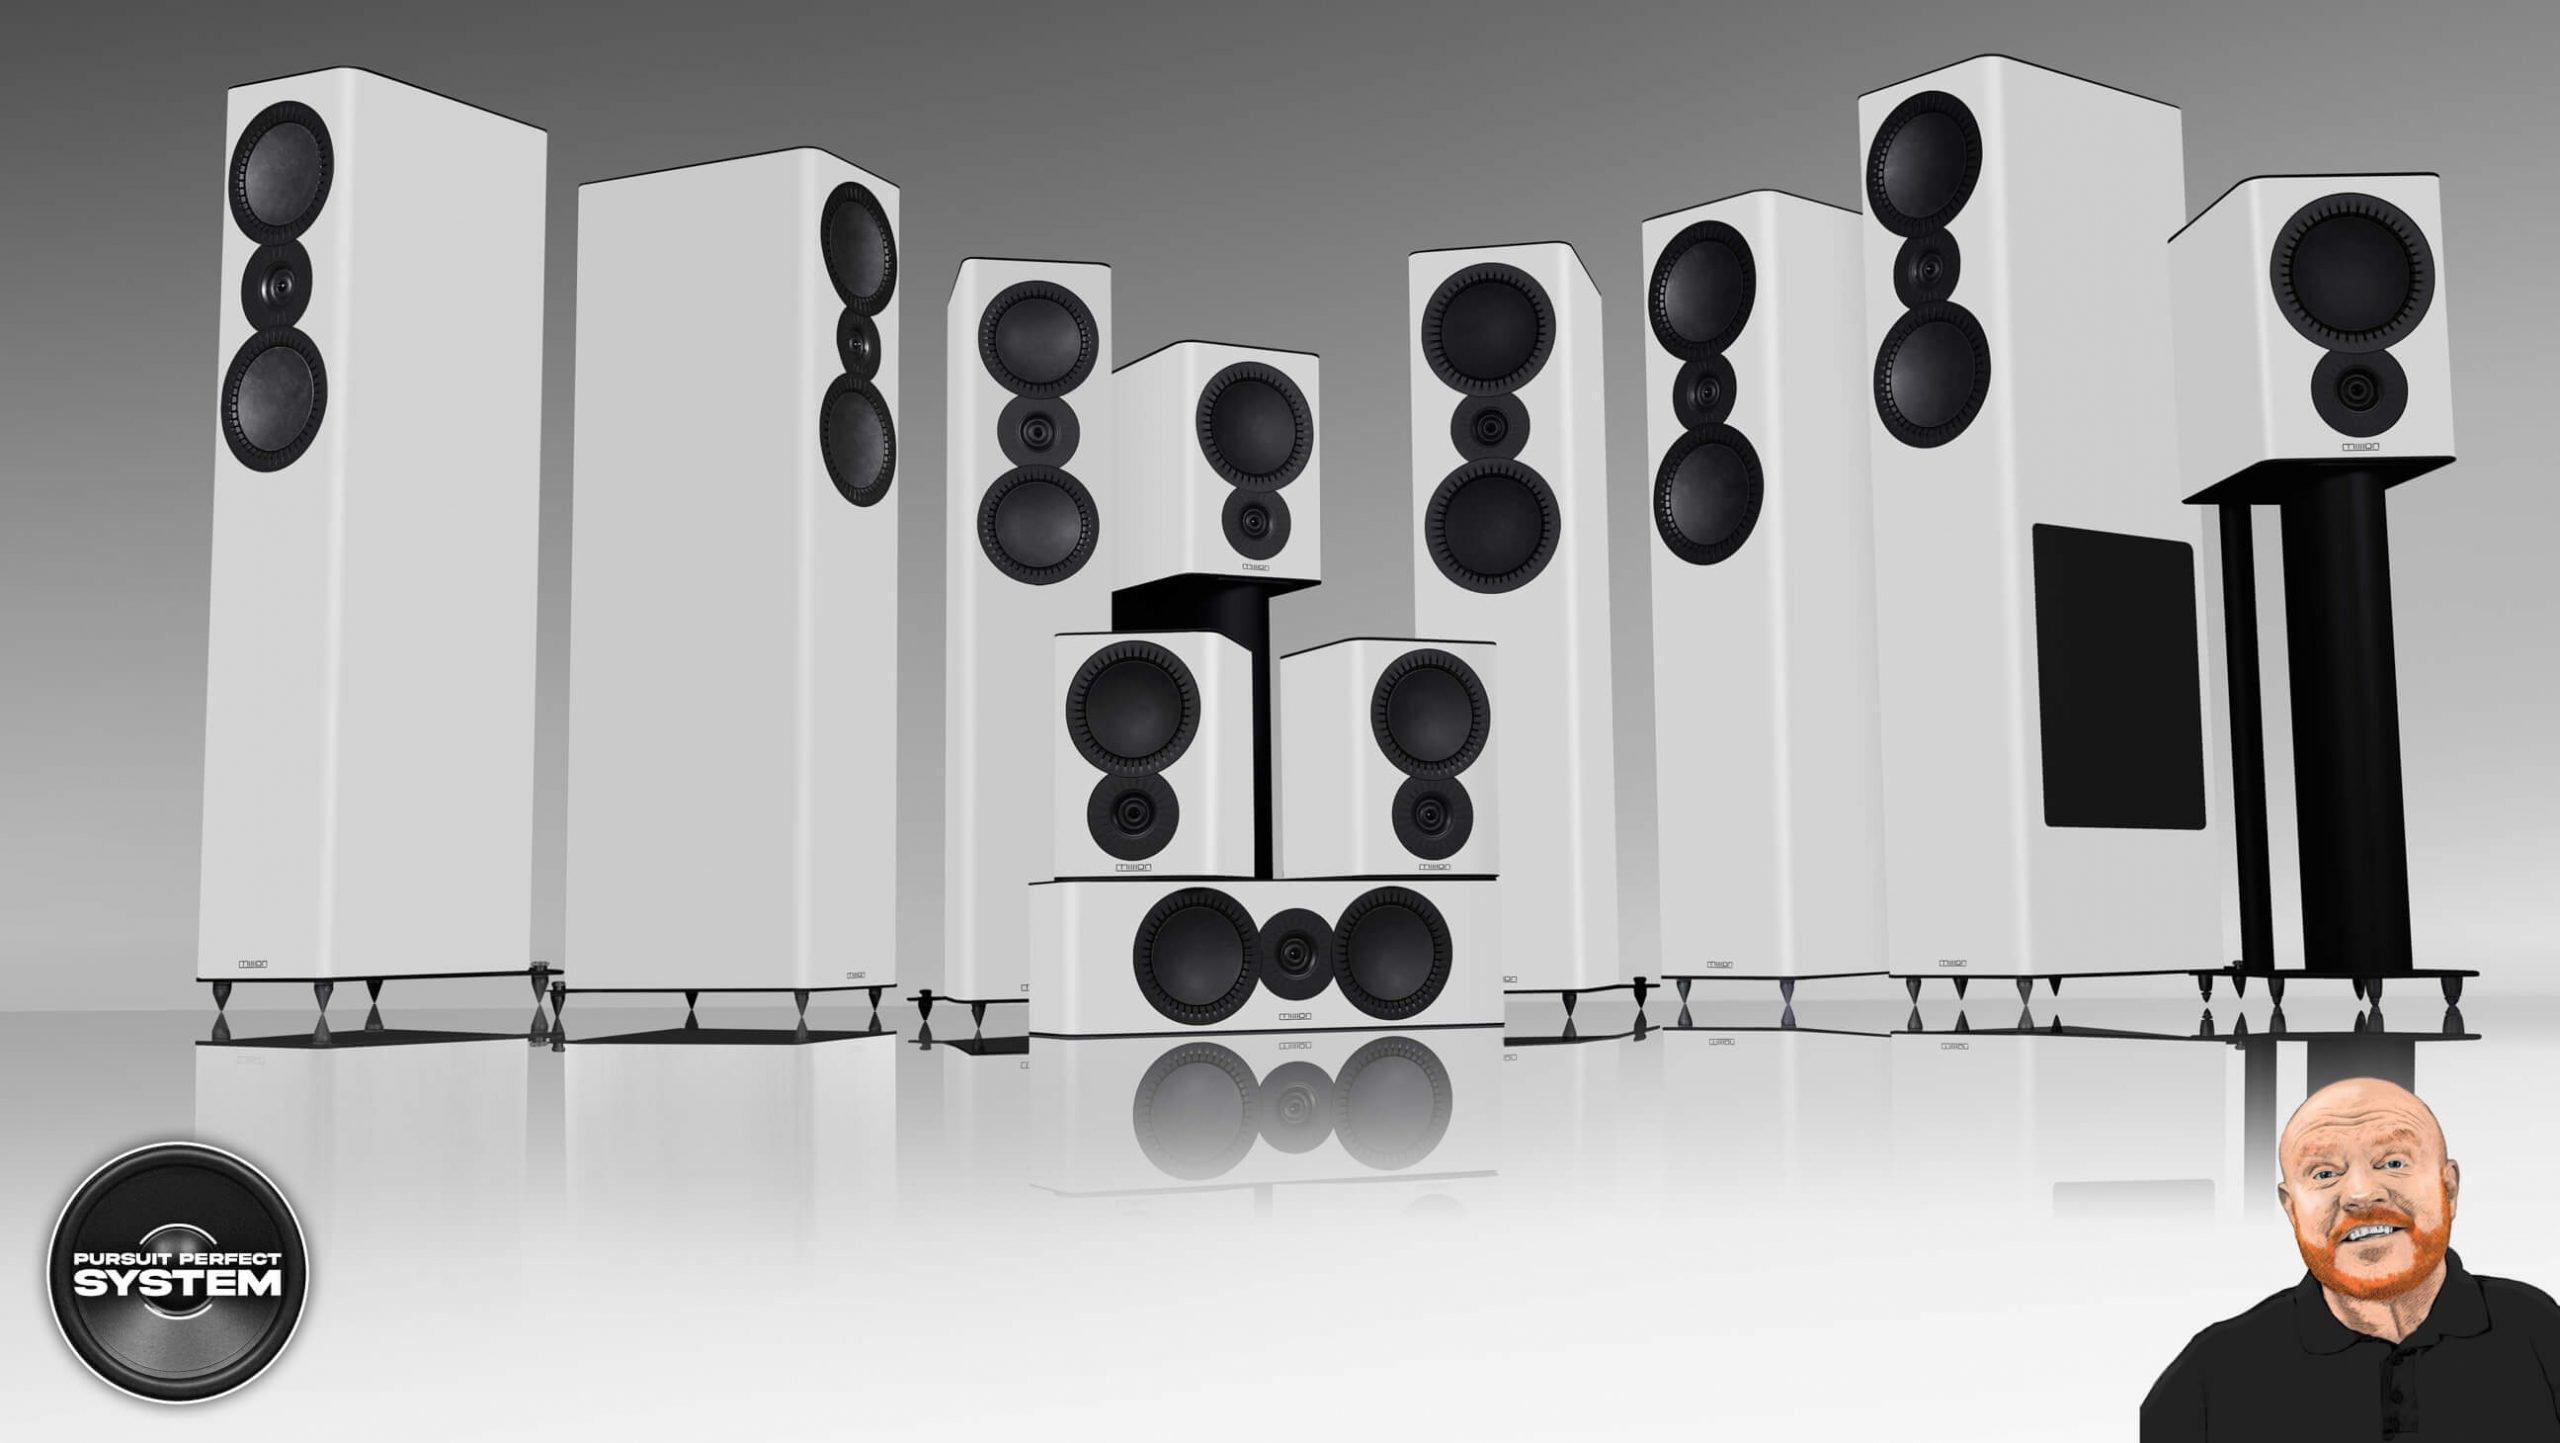 mission qx mk 2 II hifi speakers website 1